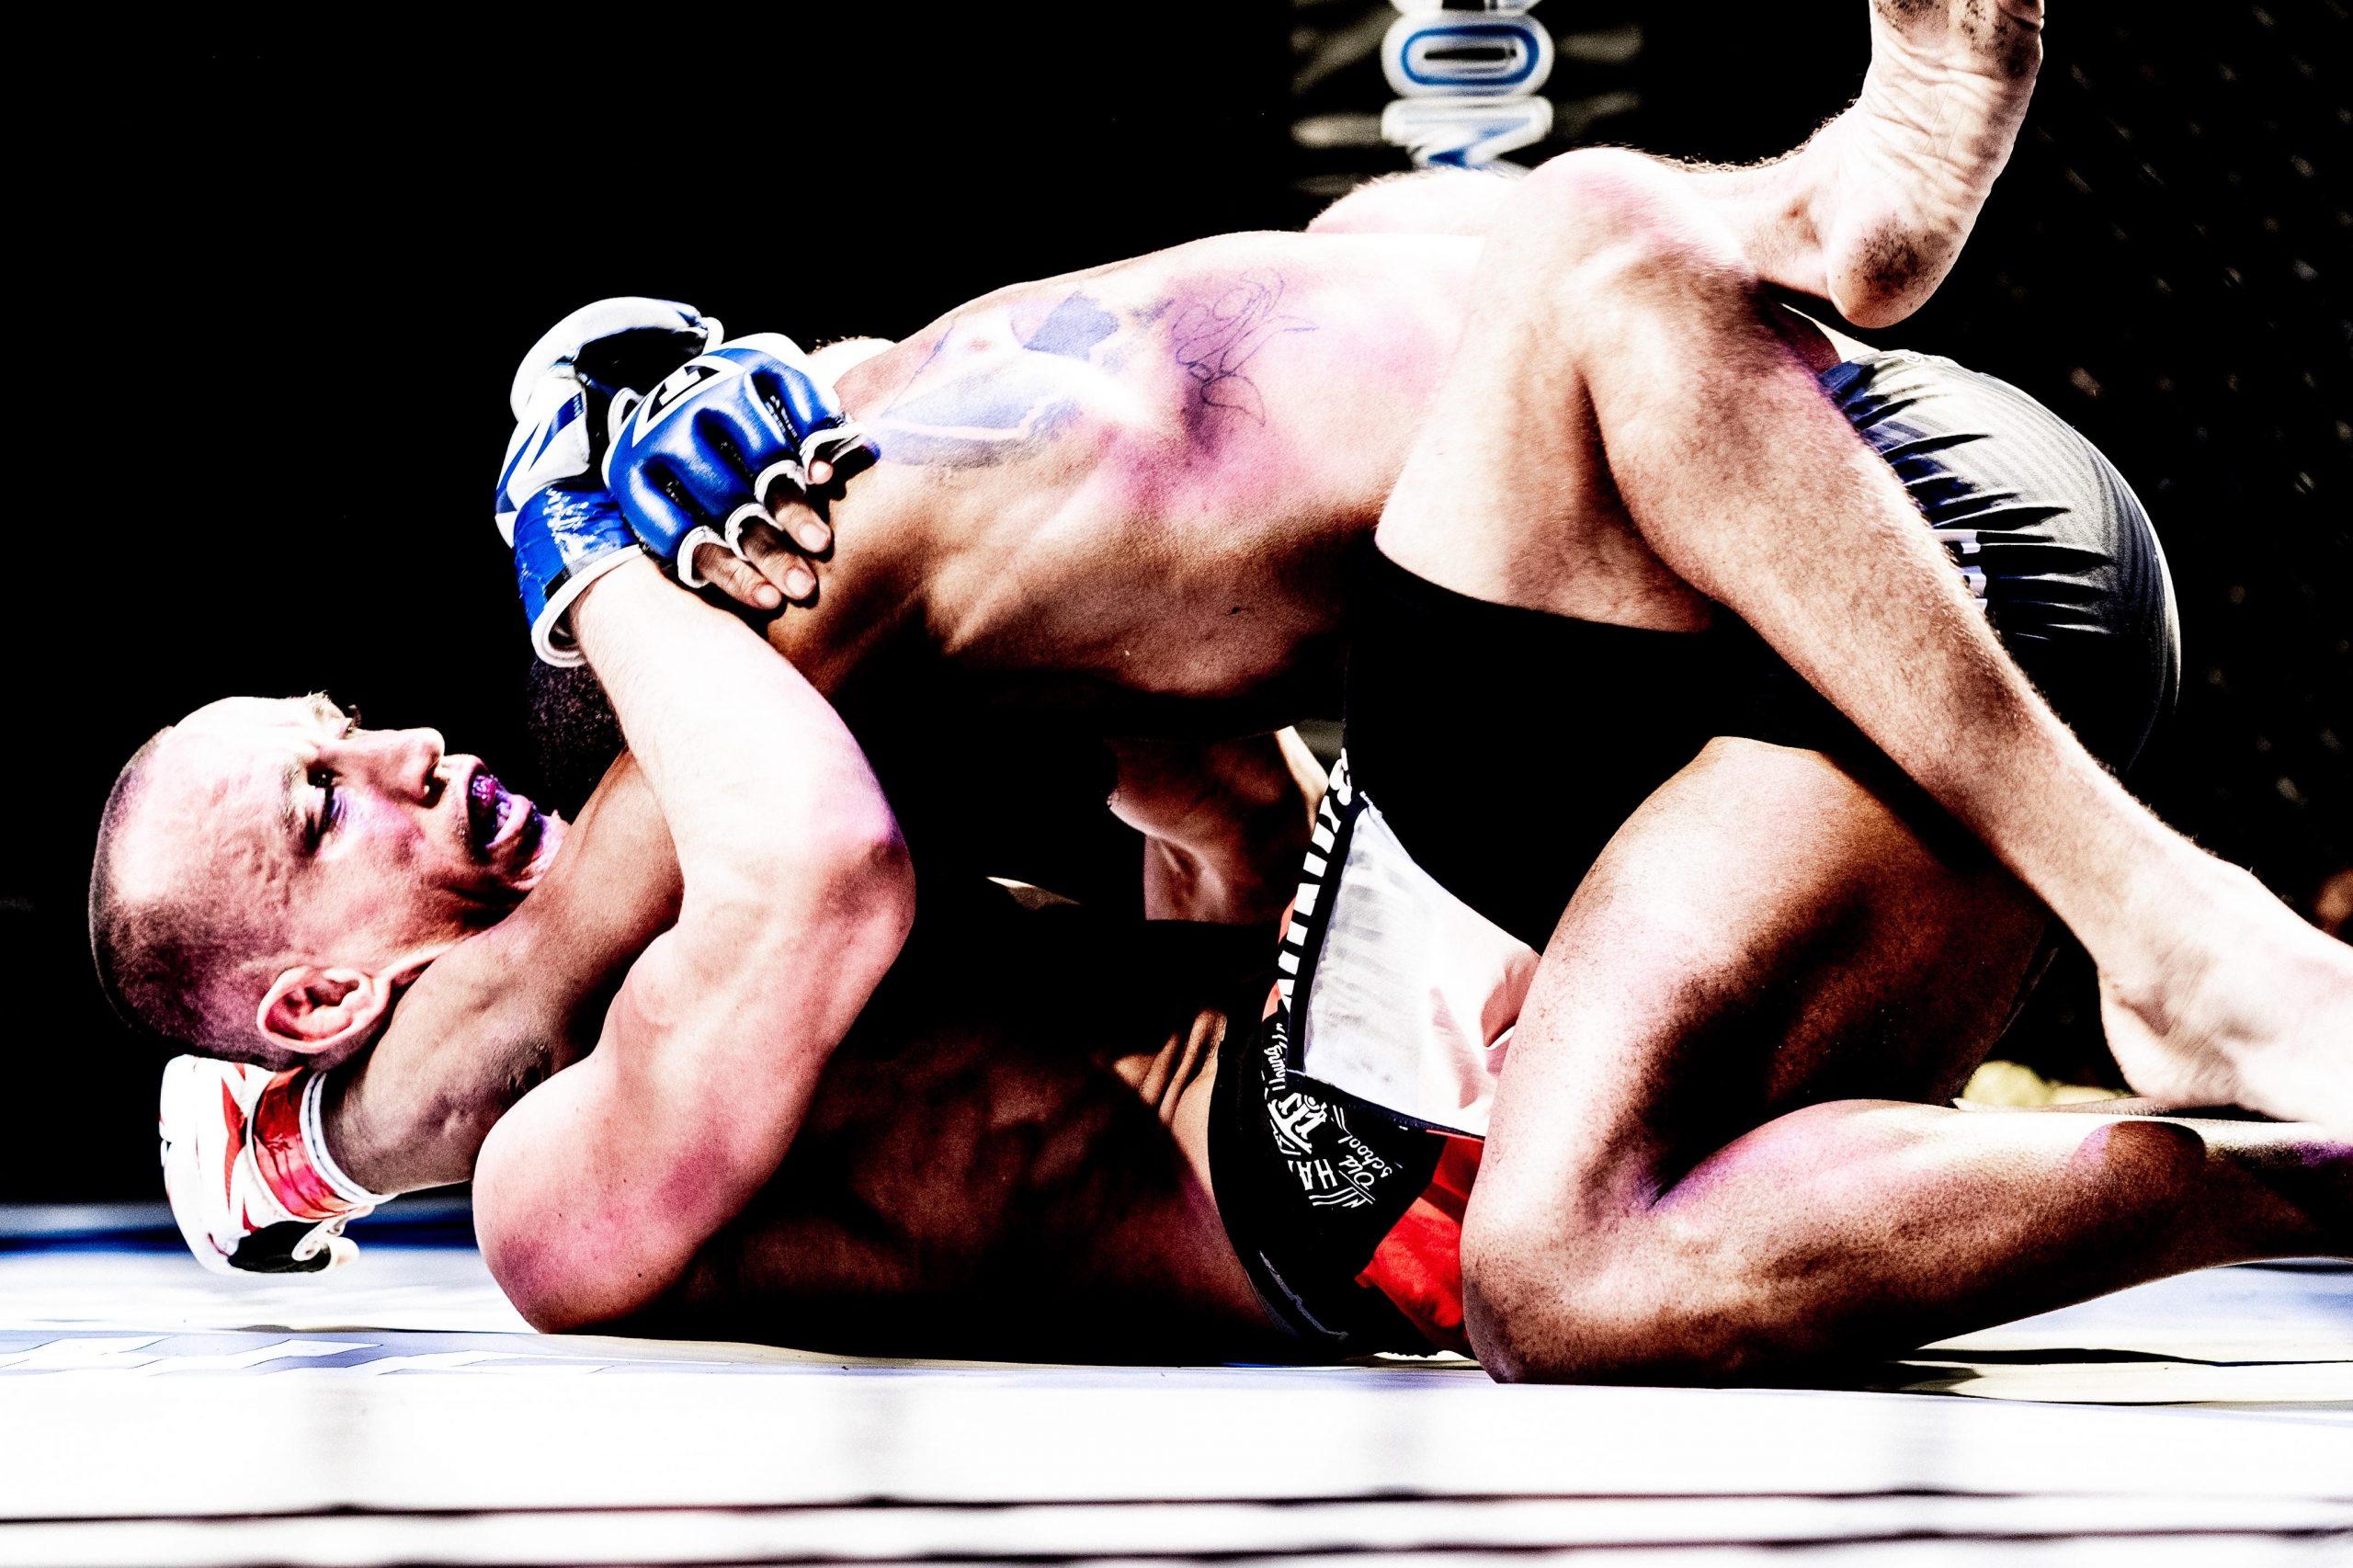 Alfred Leisure (bottom) vs. Corey Dulaney - Ohio Combat League 5 - Photo by Dave Hatfield (thelastwhitesquirrel)